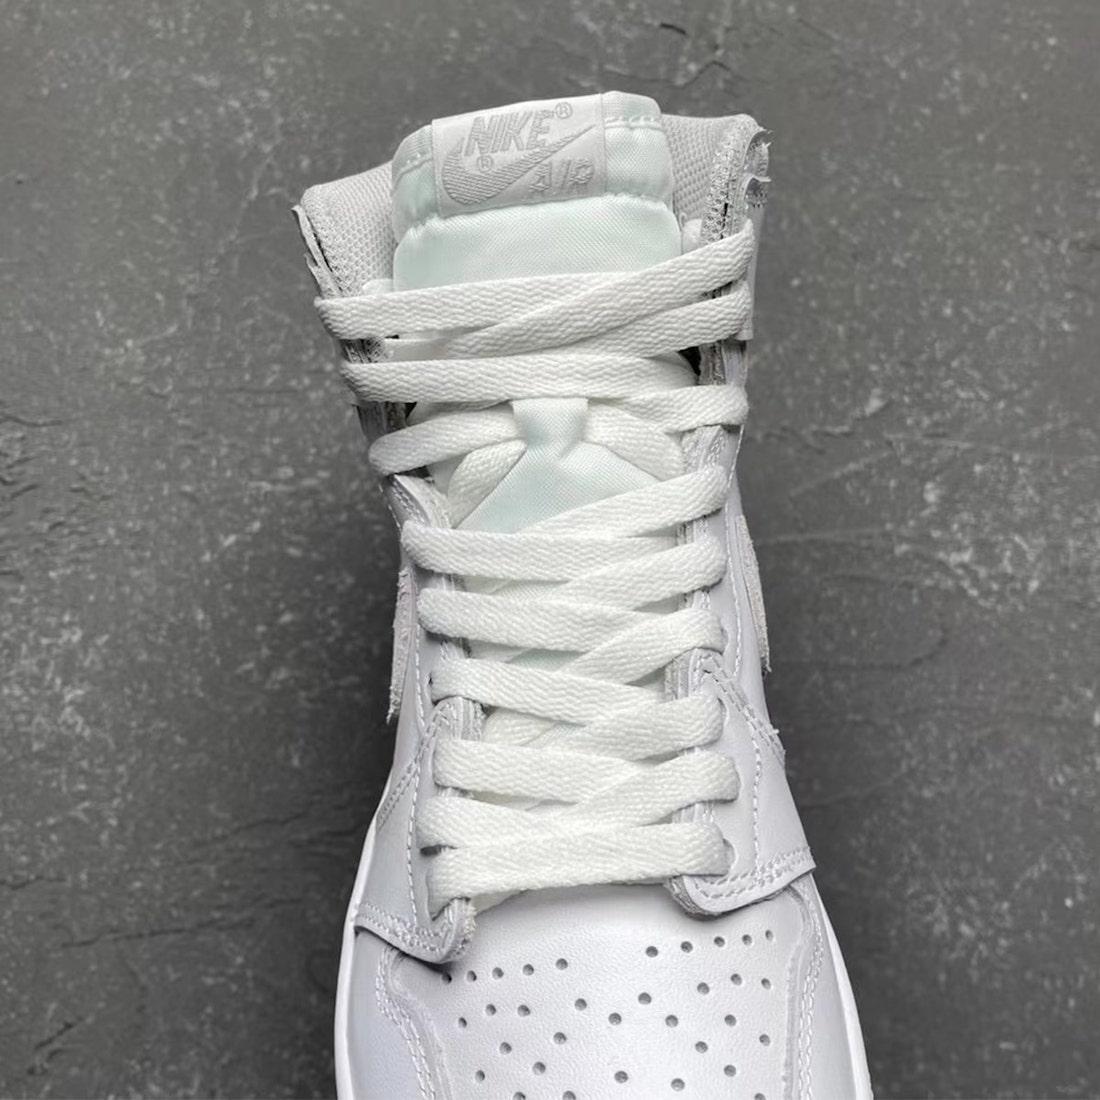 "Nike Air Jordan 1 High '85 ""Neutral Grey"" ナイキ エアジョーダン1 ハイ 85 ""ニュートラルグレー"" White/ Neutral Grey BQ4422-100"